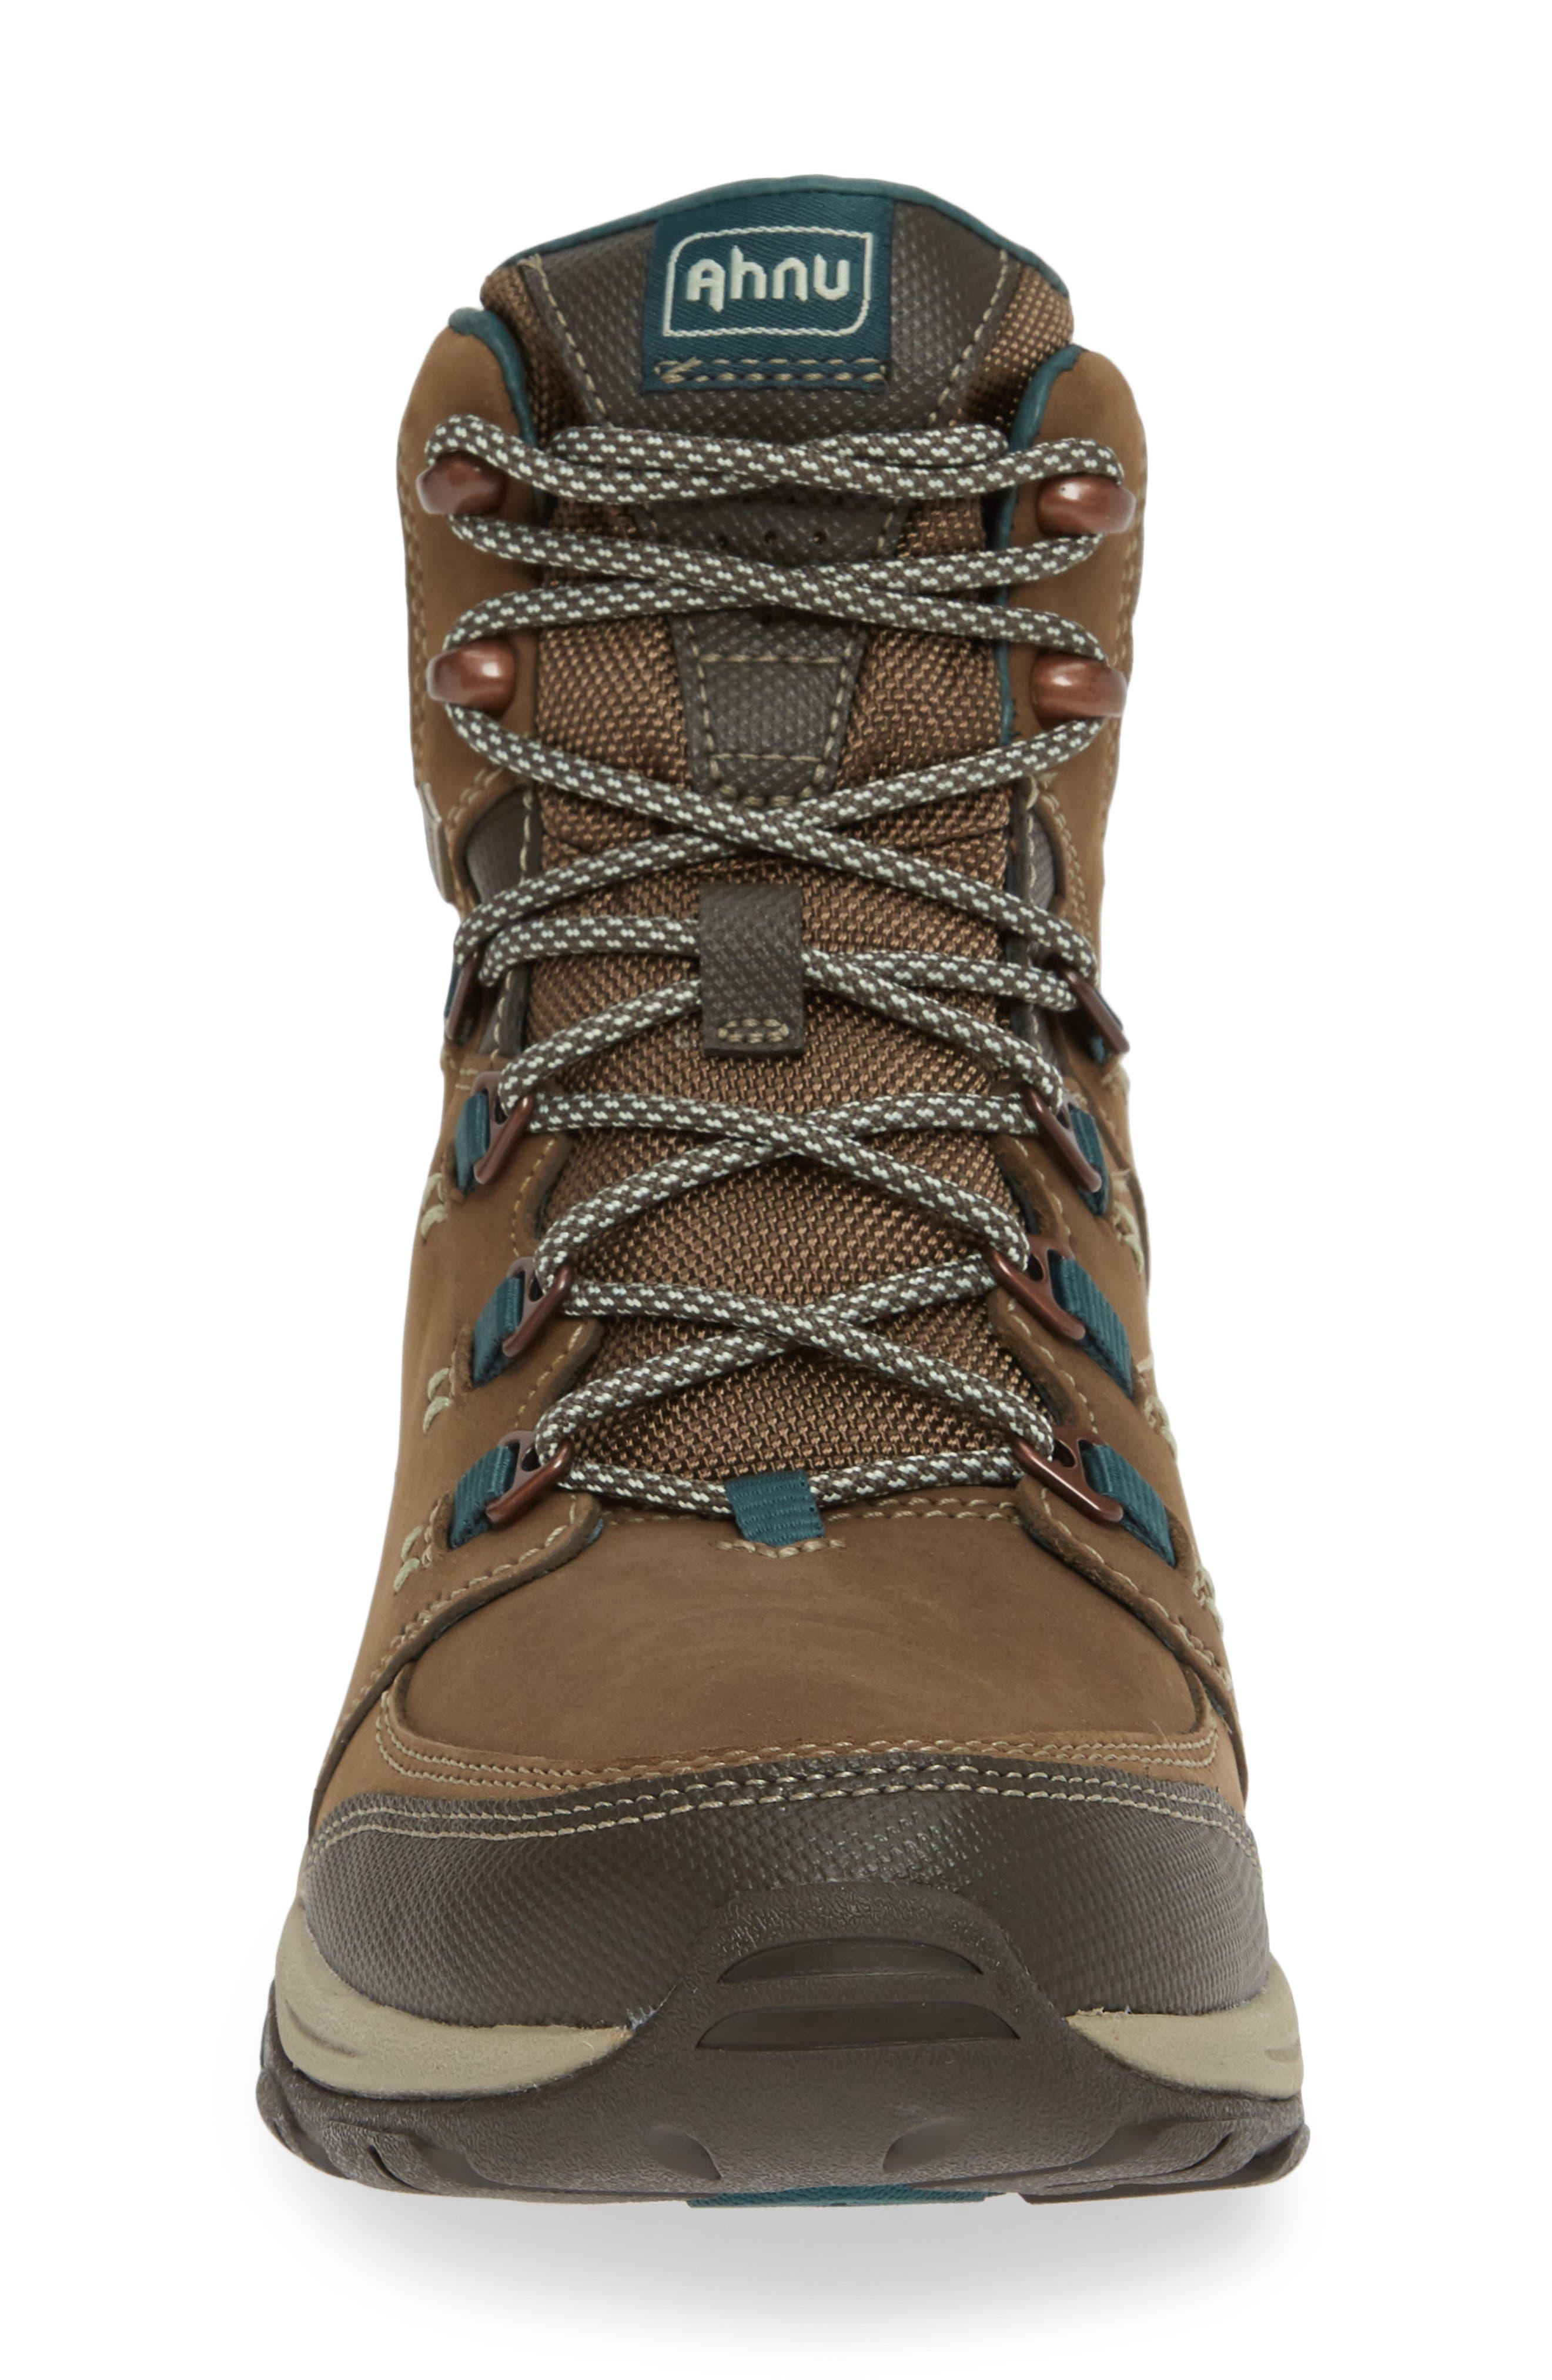 Ahnu by Teva Montara III Waterproof Hiking Boot,                             Alternate thumbnail 4, color,                             CHOCOLATE CHIP NUBUCK LEATHER